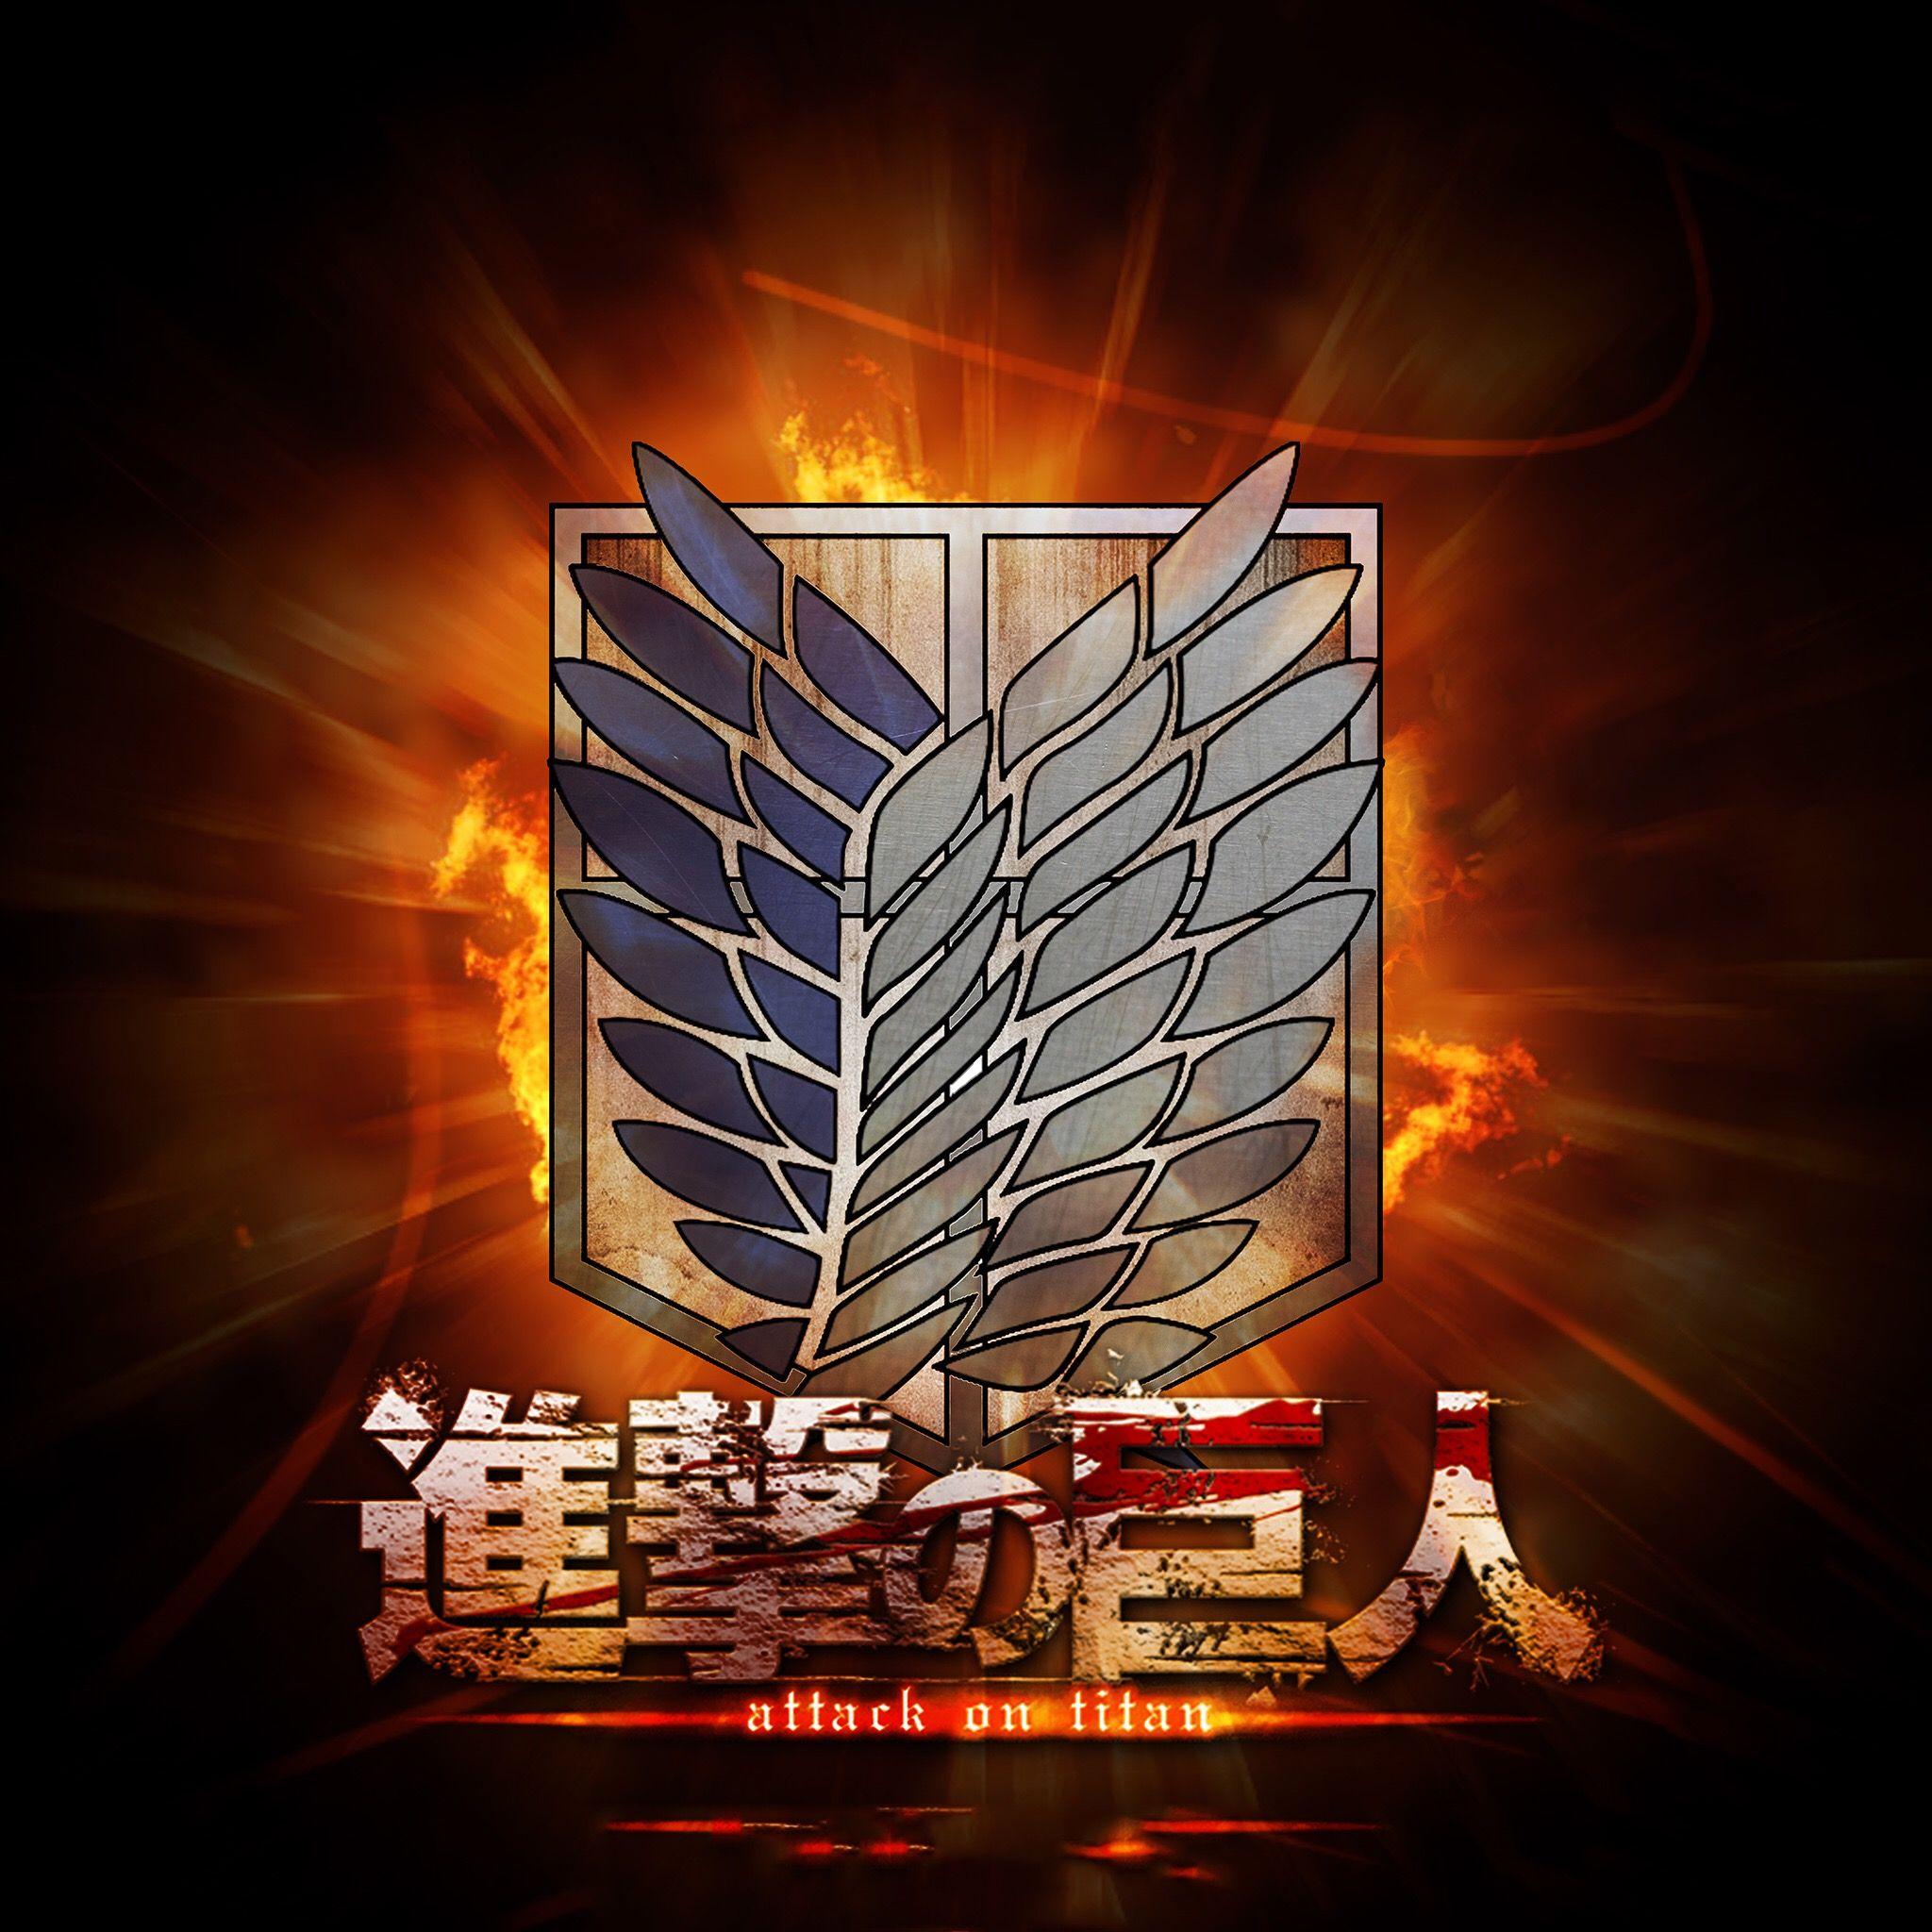 Pin by ₭Ɇ₦Jł on   SNK     Attack on titan, Titan logo ...